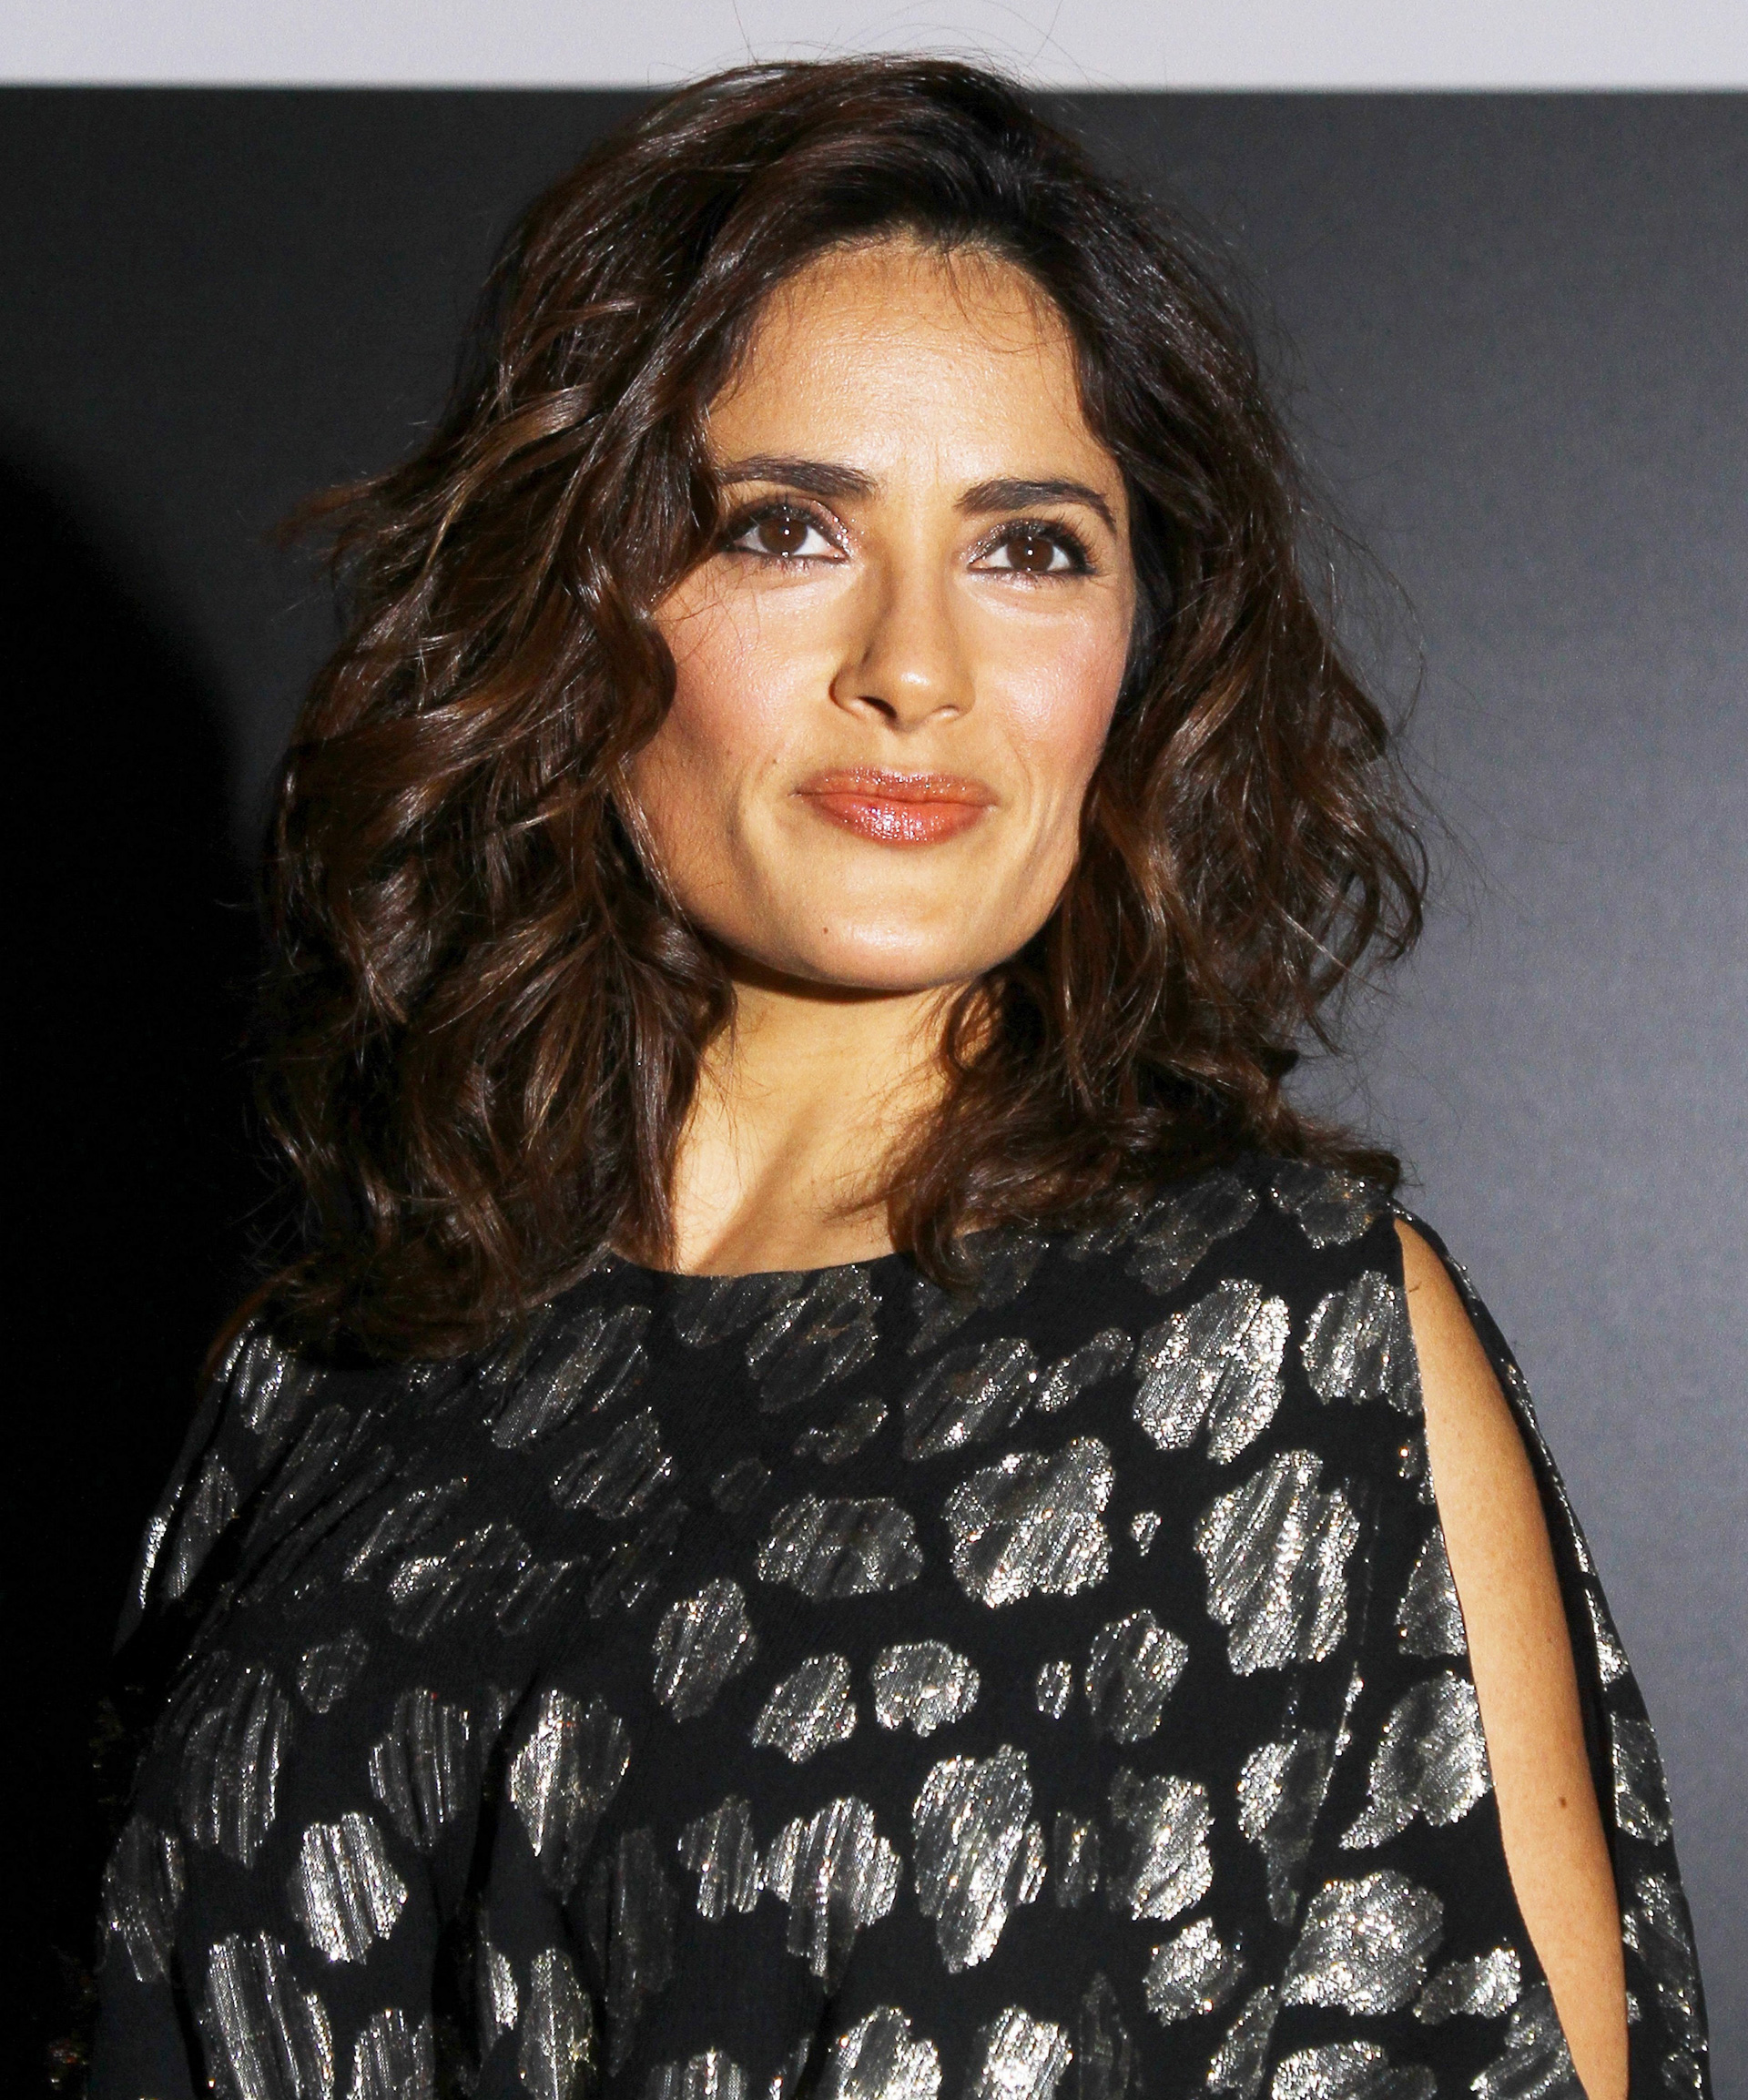 Best curls: Salma Hayek